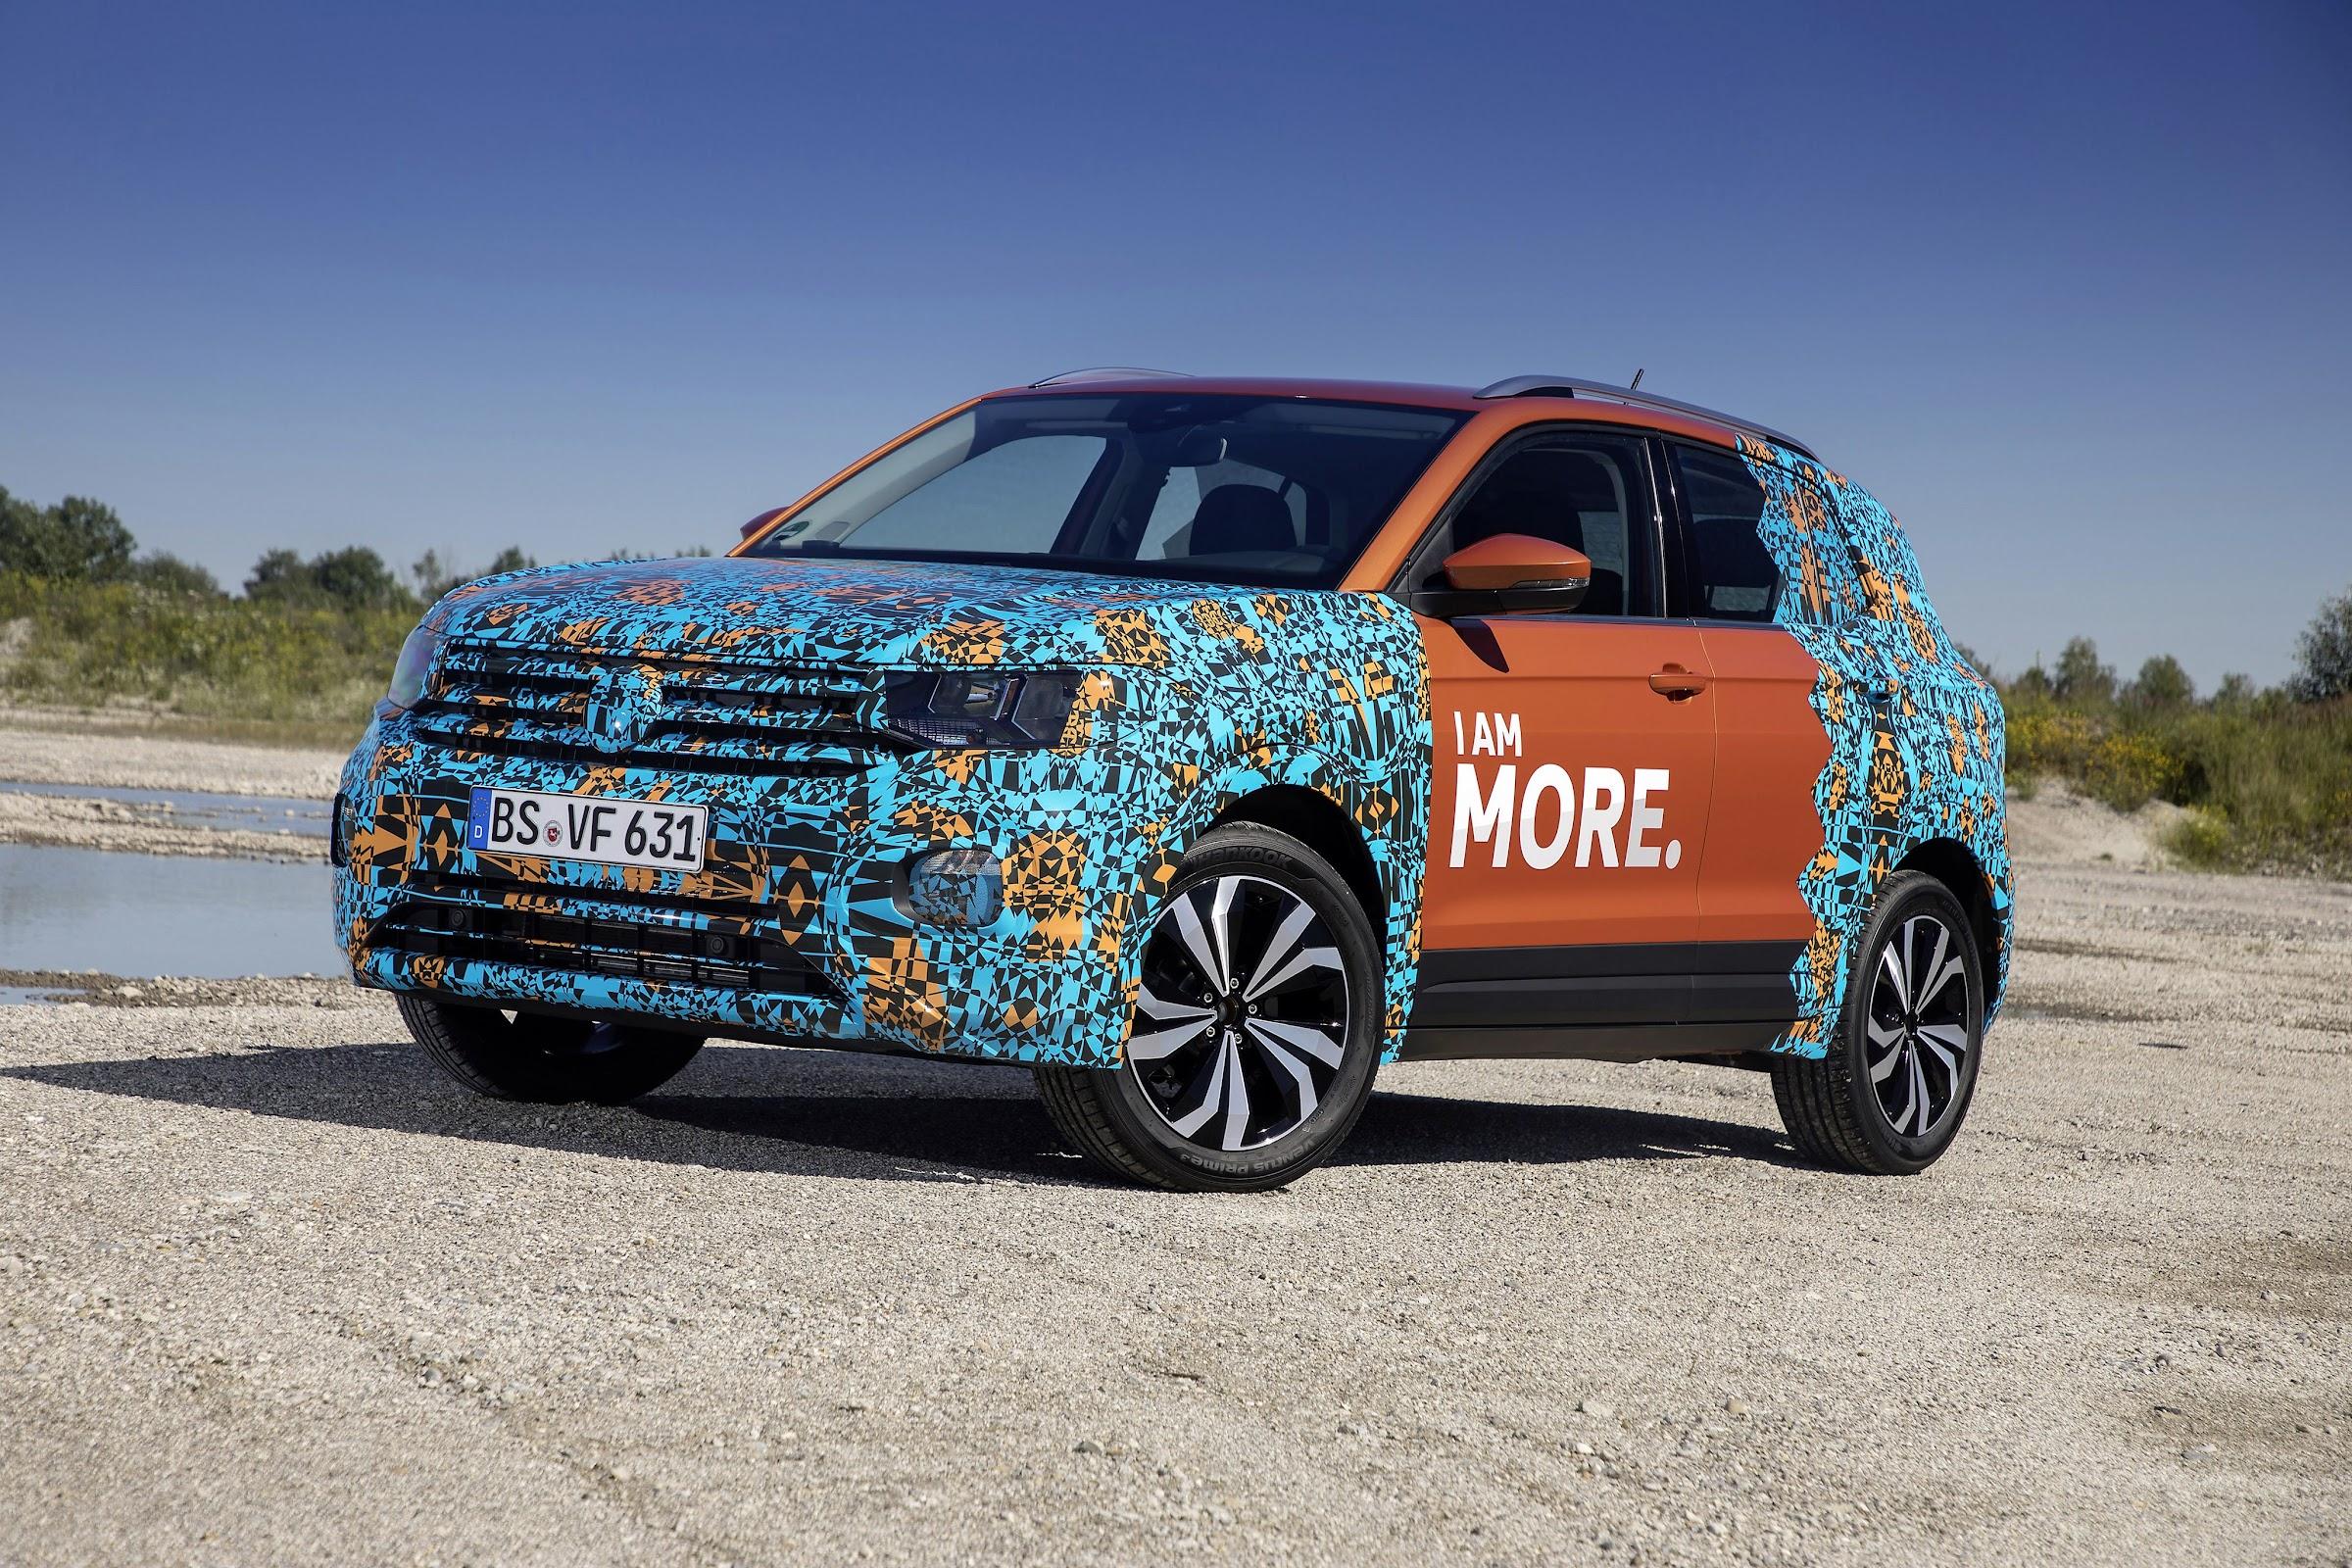 2i51K wCkKKE6ezvfYSkucYGgEnPDVy4S9bfn4eV9okQ3nmAAzaawDOHY4A9MmPnuLxpo9GkblUgN4URdIm24EHhxsUnwQfGEtIY8VZxRowyi4RJxOusslzhxUfkO9Vv9JwBXj148A=w2400 - T-Cross: el SUV compacto de Volkswagen